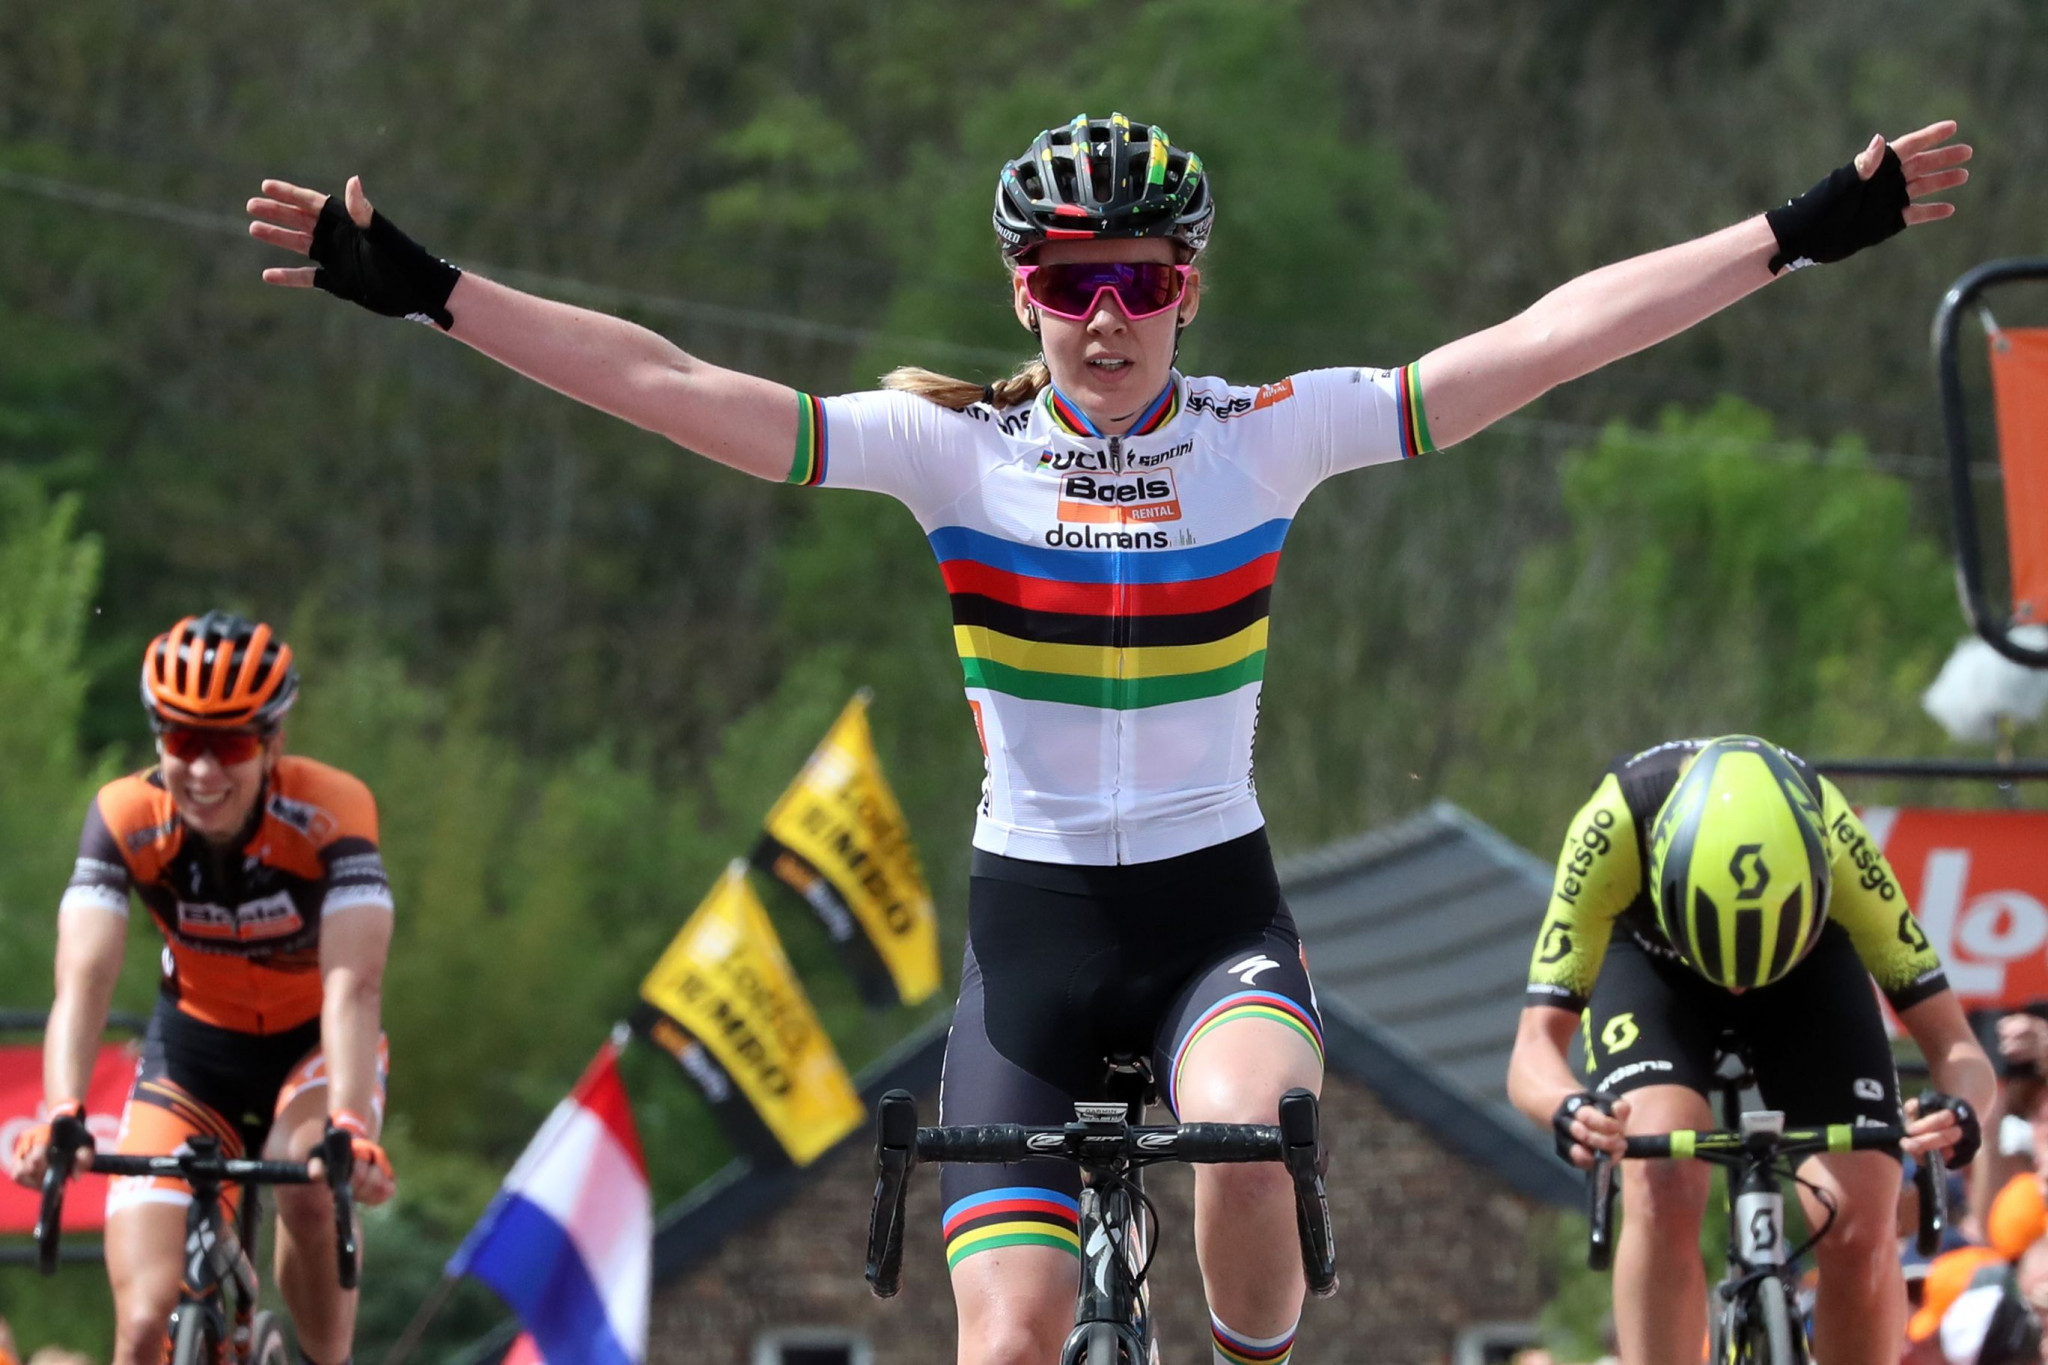 Dutch rider Anna van der Breggen is defending the women's road race crown ©Getty Images